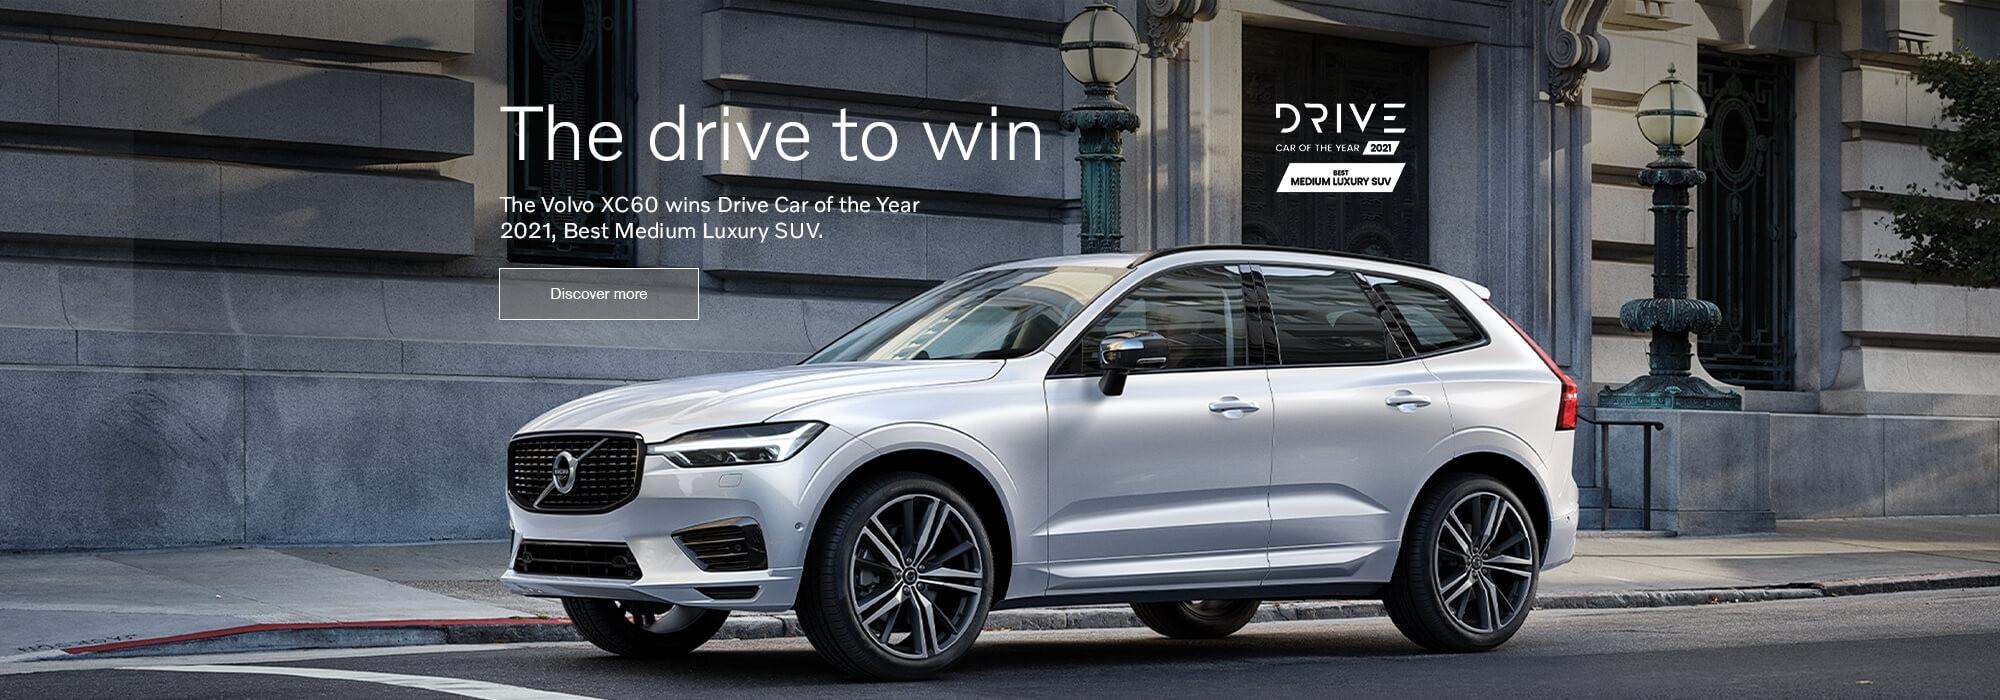 The Volvo XC60 wins Drive Car of the Year 2021, Best Medium Luxury SUV.